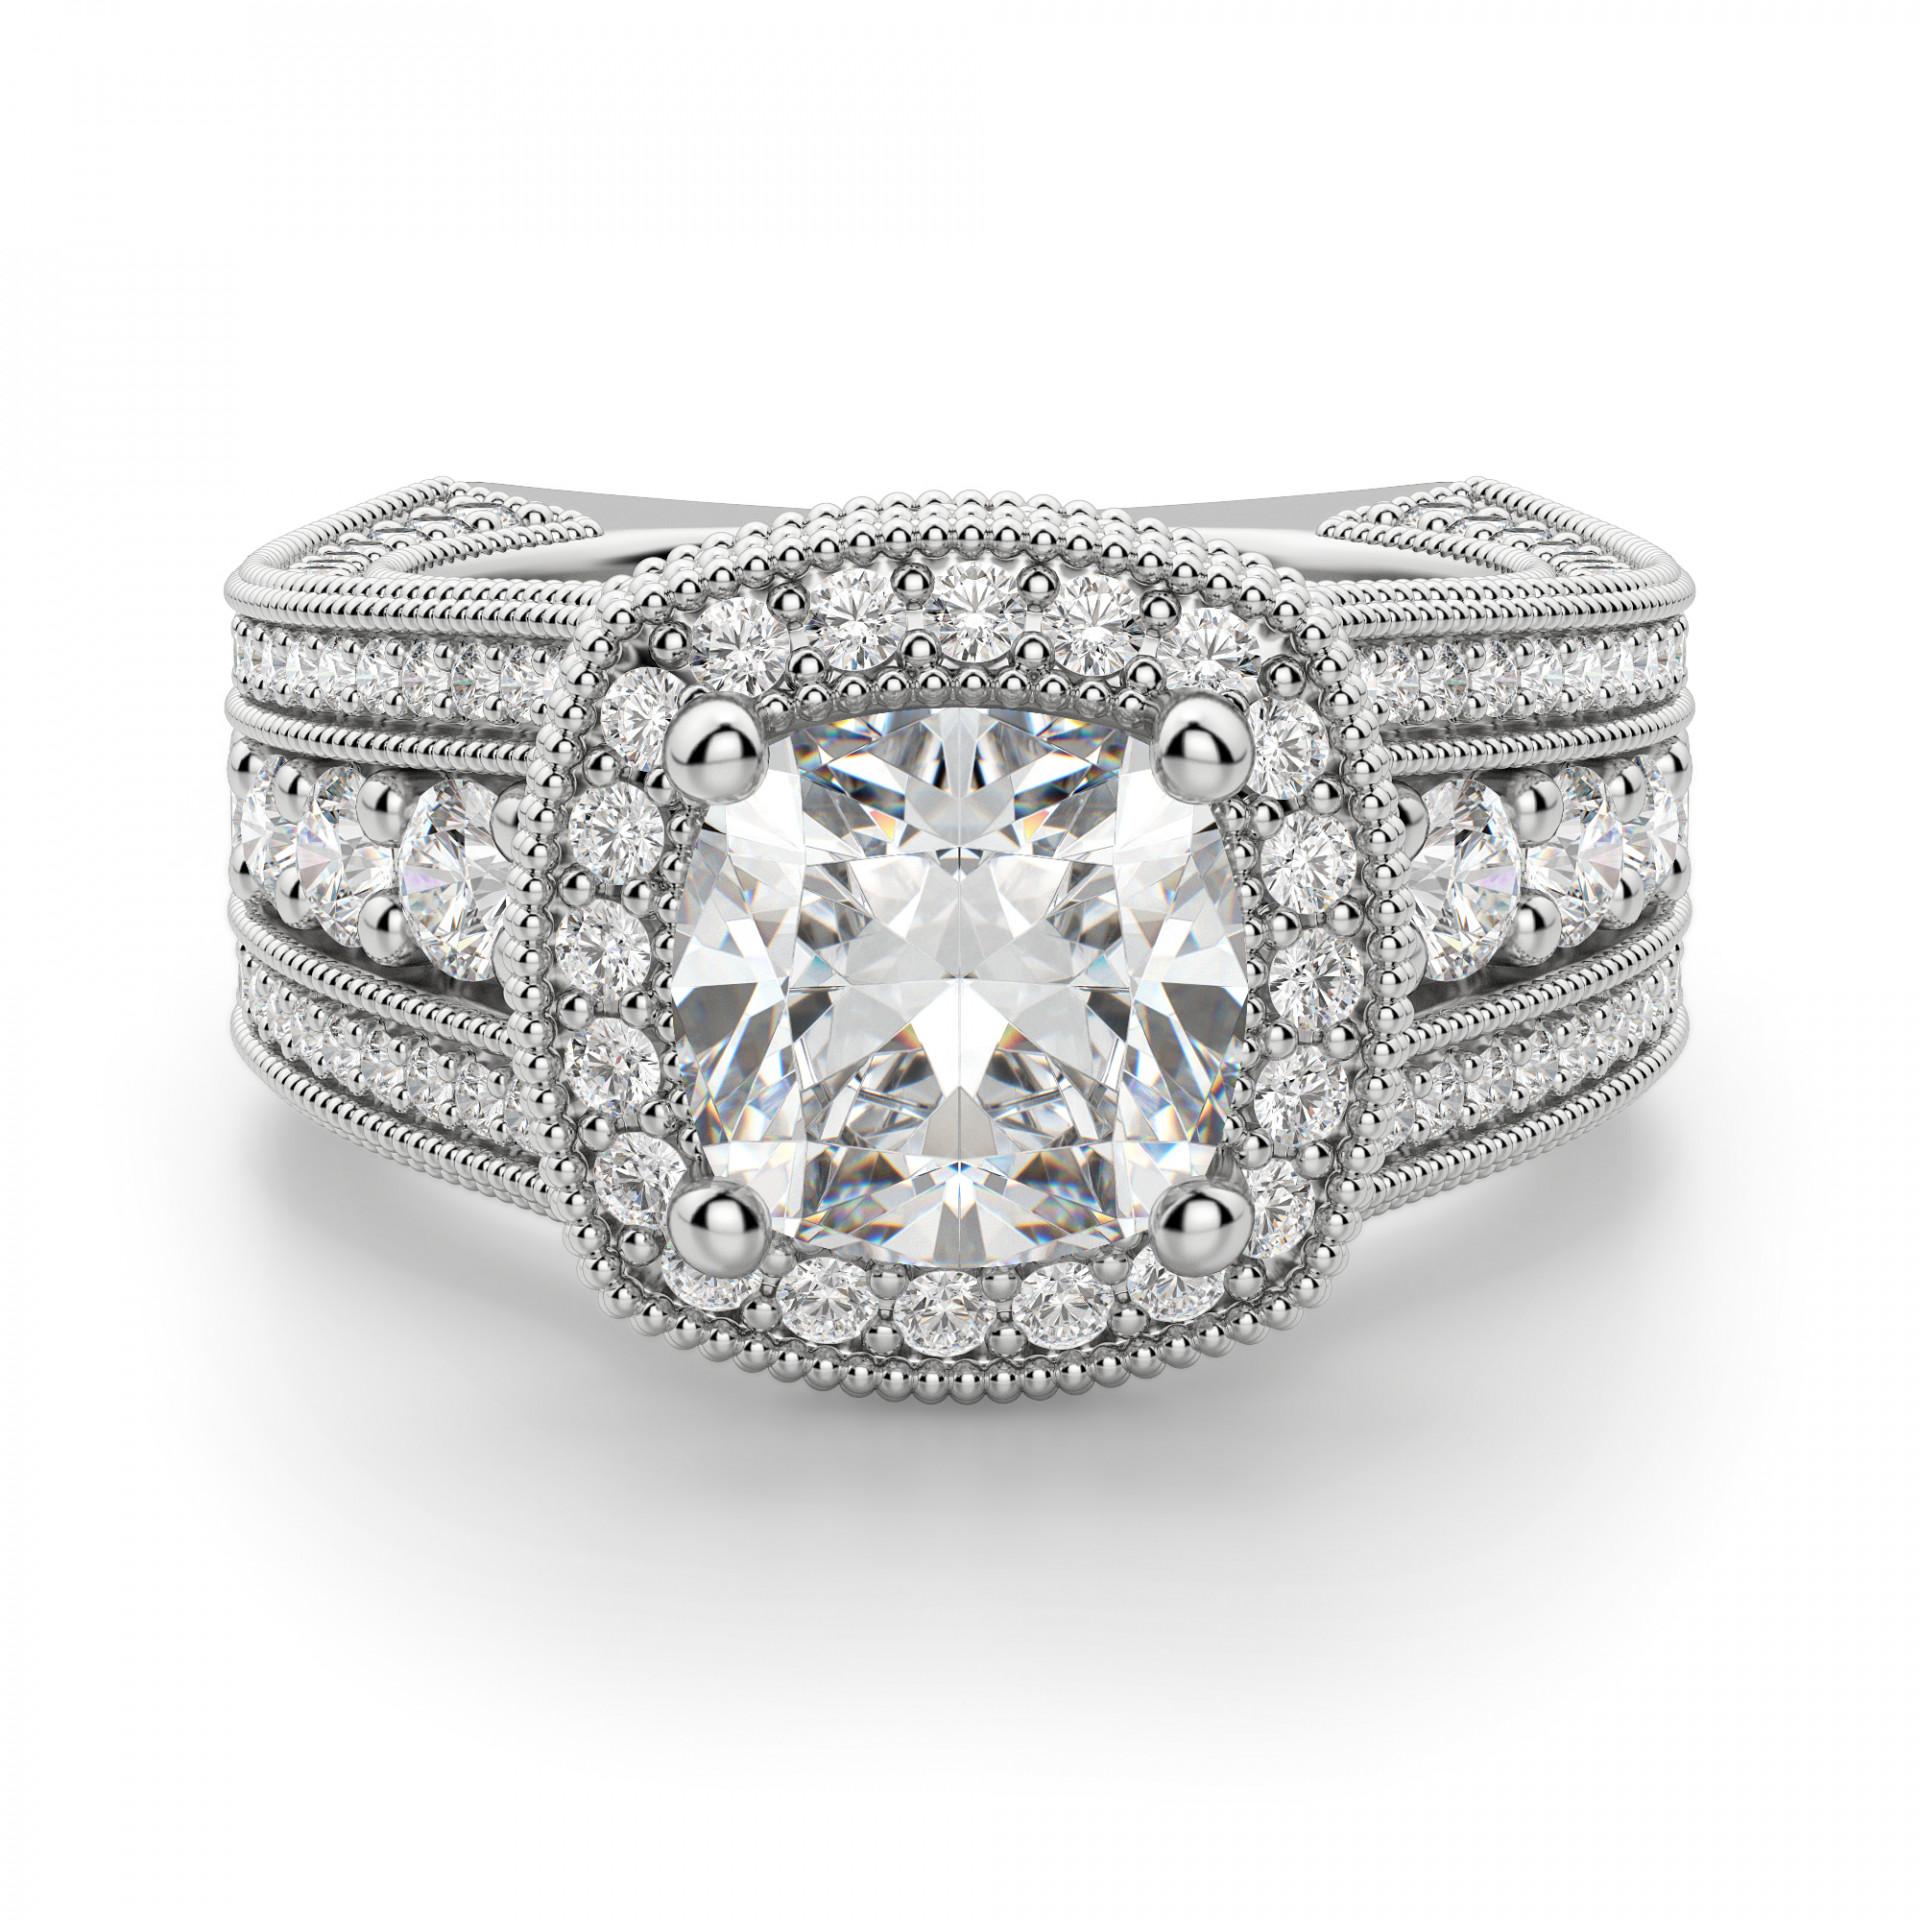 1: The Flash Inspired Wedding Ring At Websimilar.org